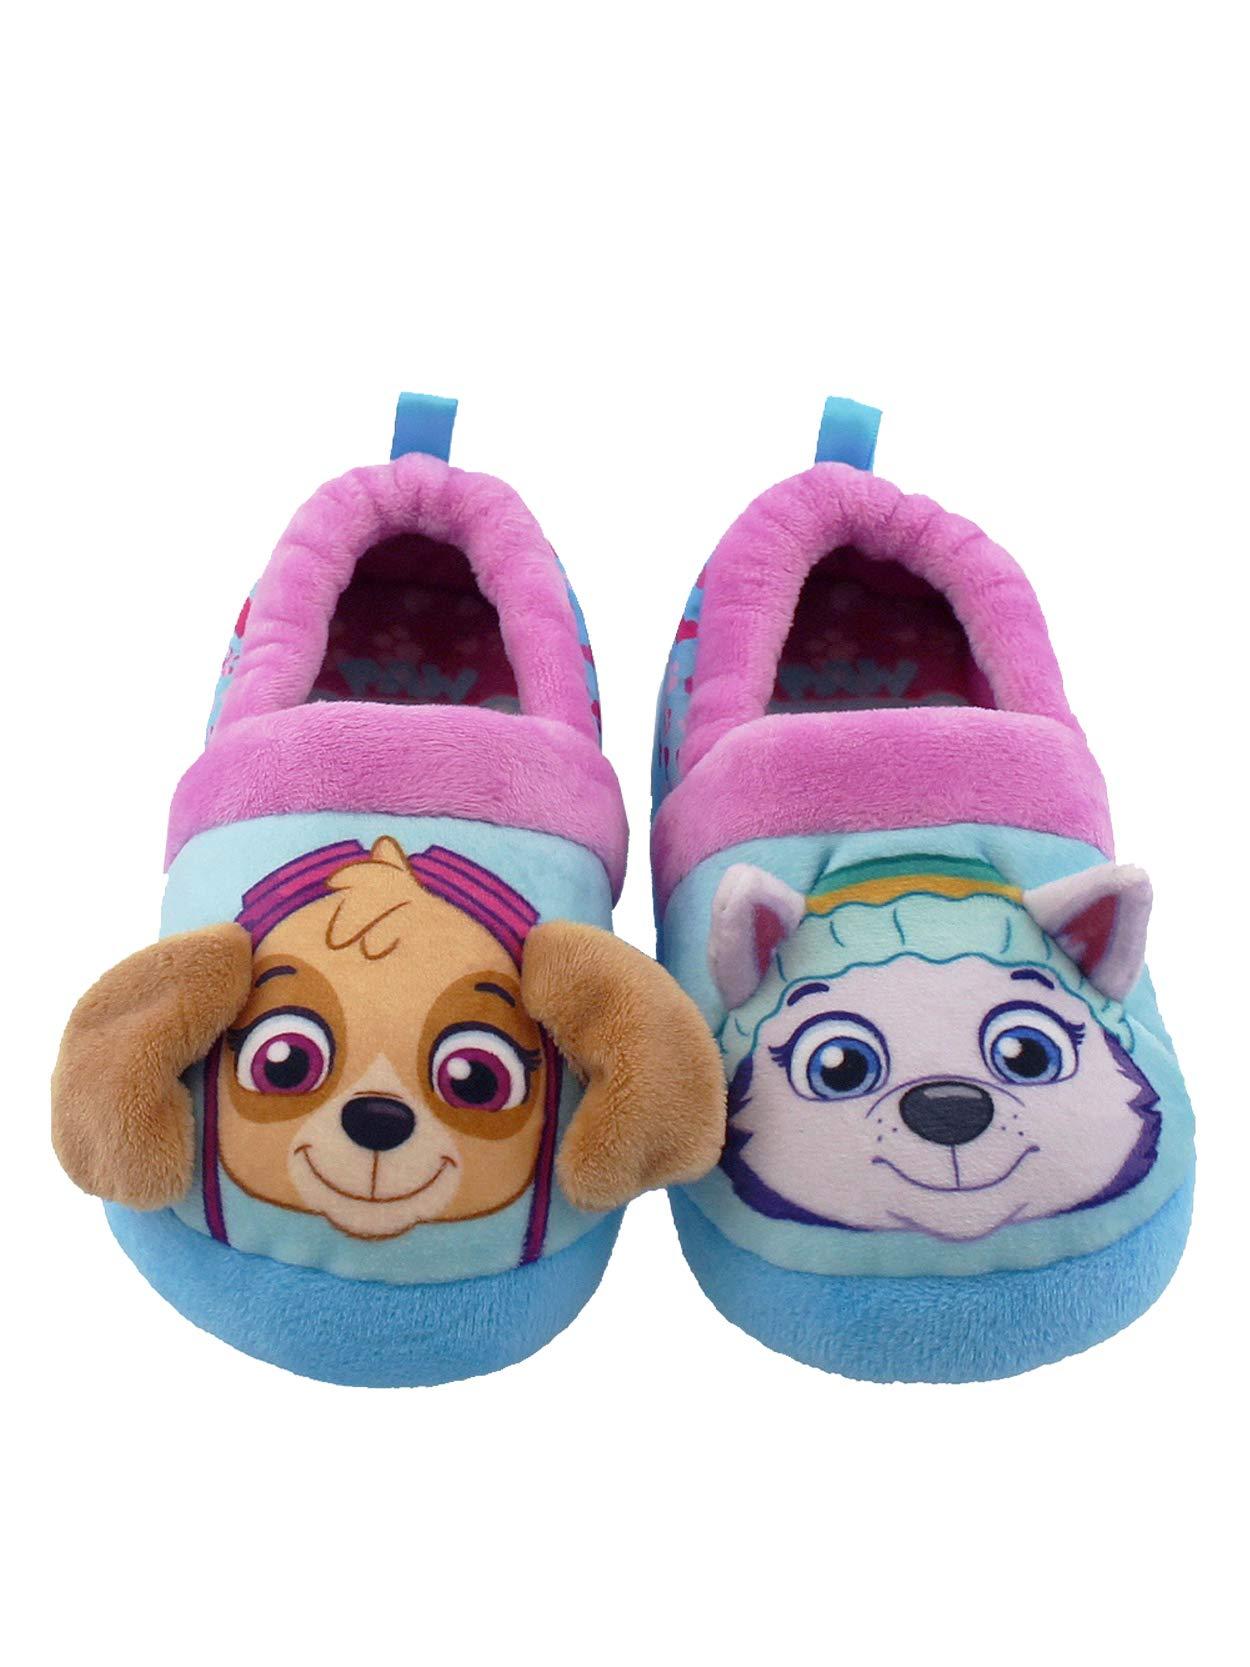 Paw Patrol Skye Everest Toddler Girls Plush Aline Slippers (9-10 M US Toddler, Blue/Purple)